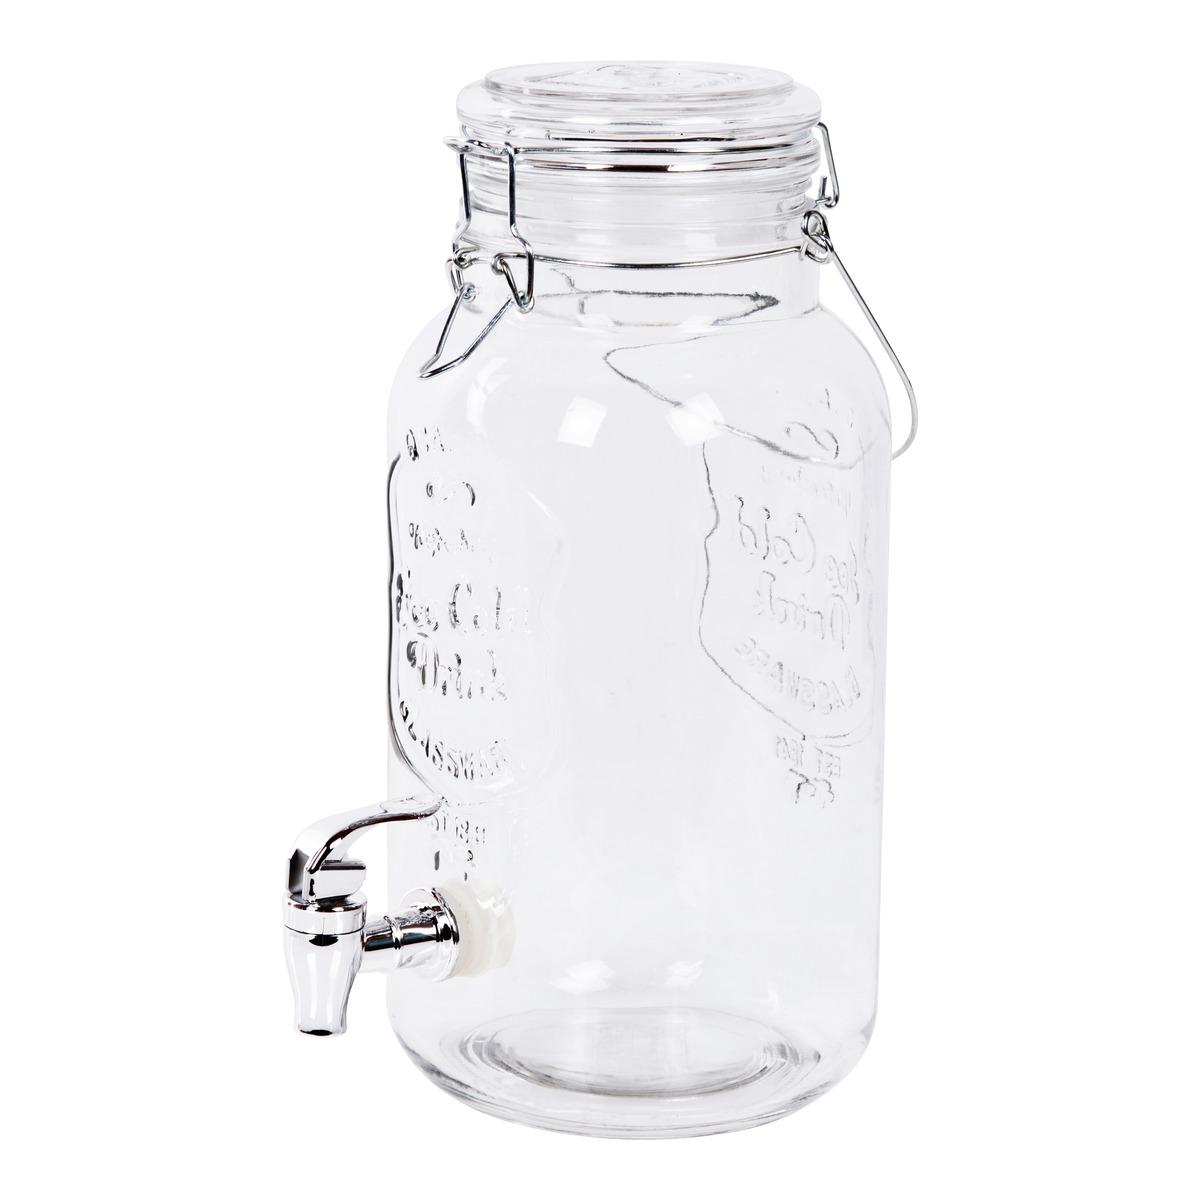 Glassbeholder m/tappekran-MUG835